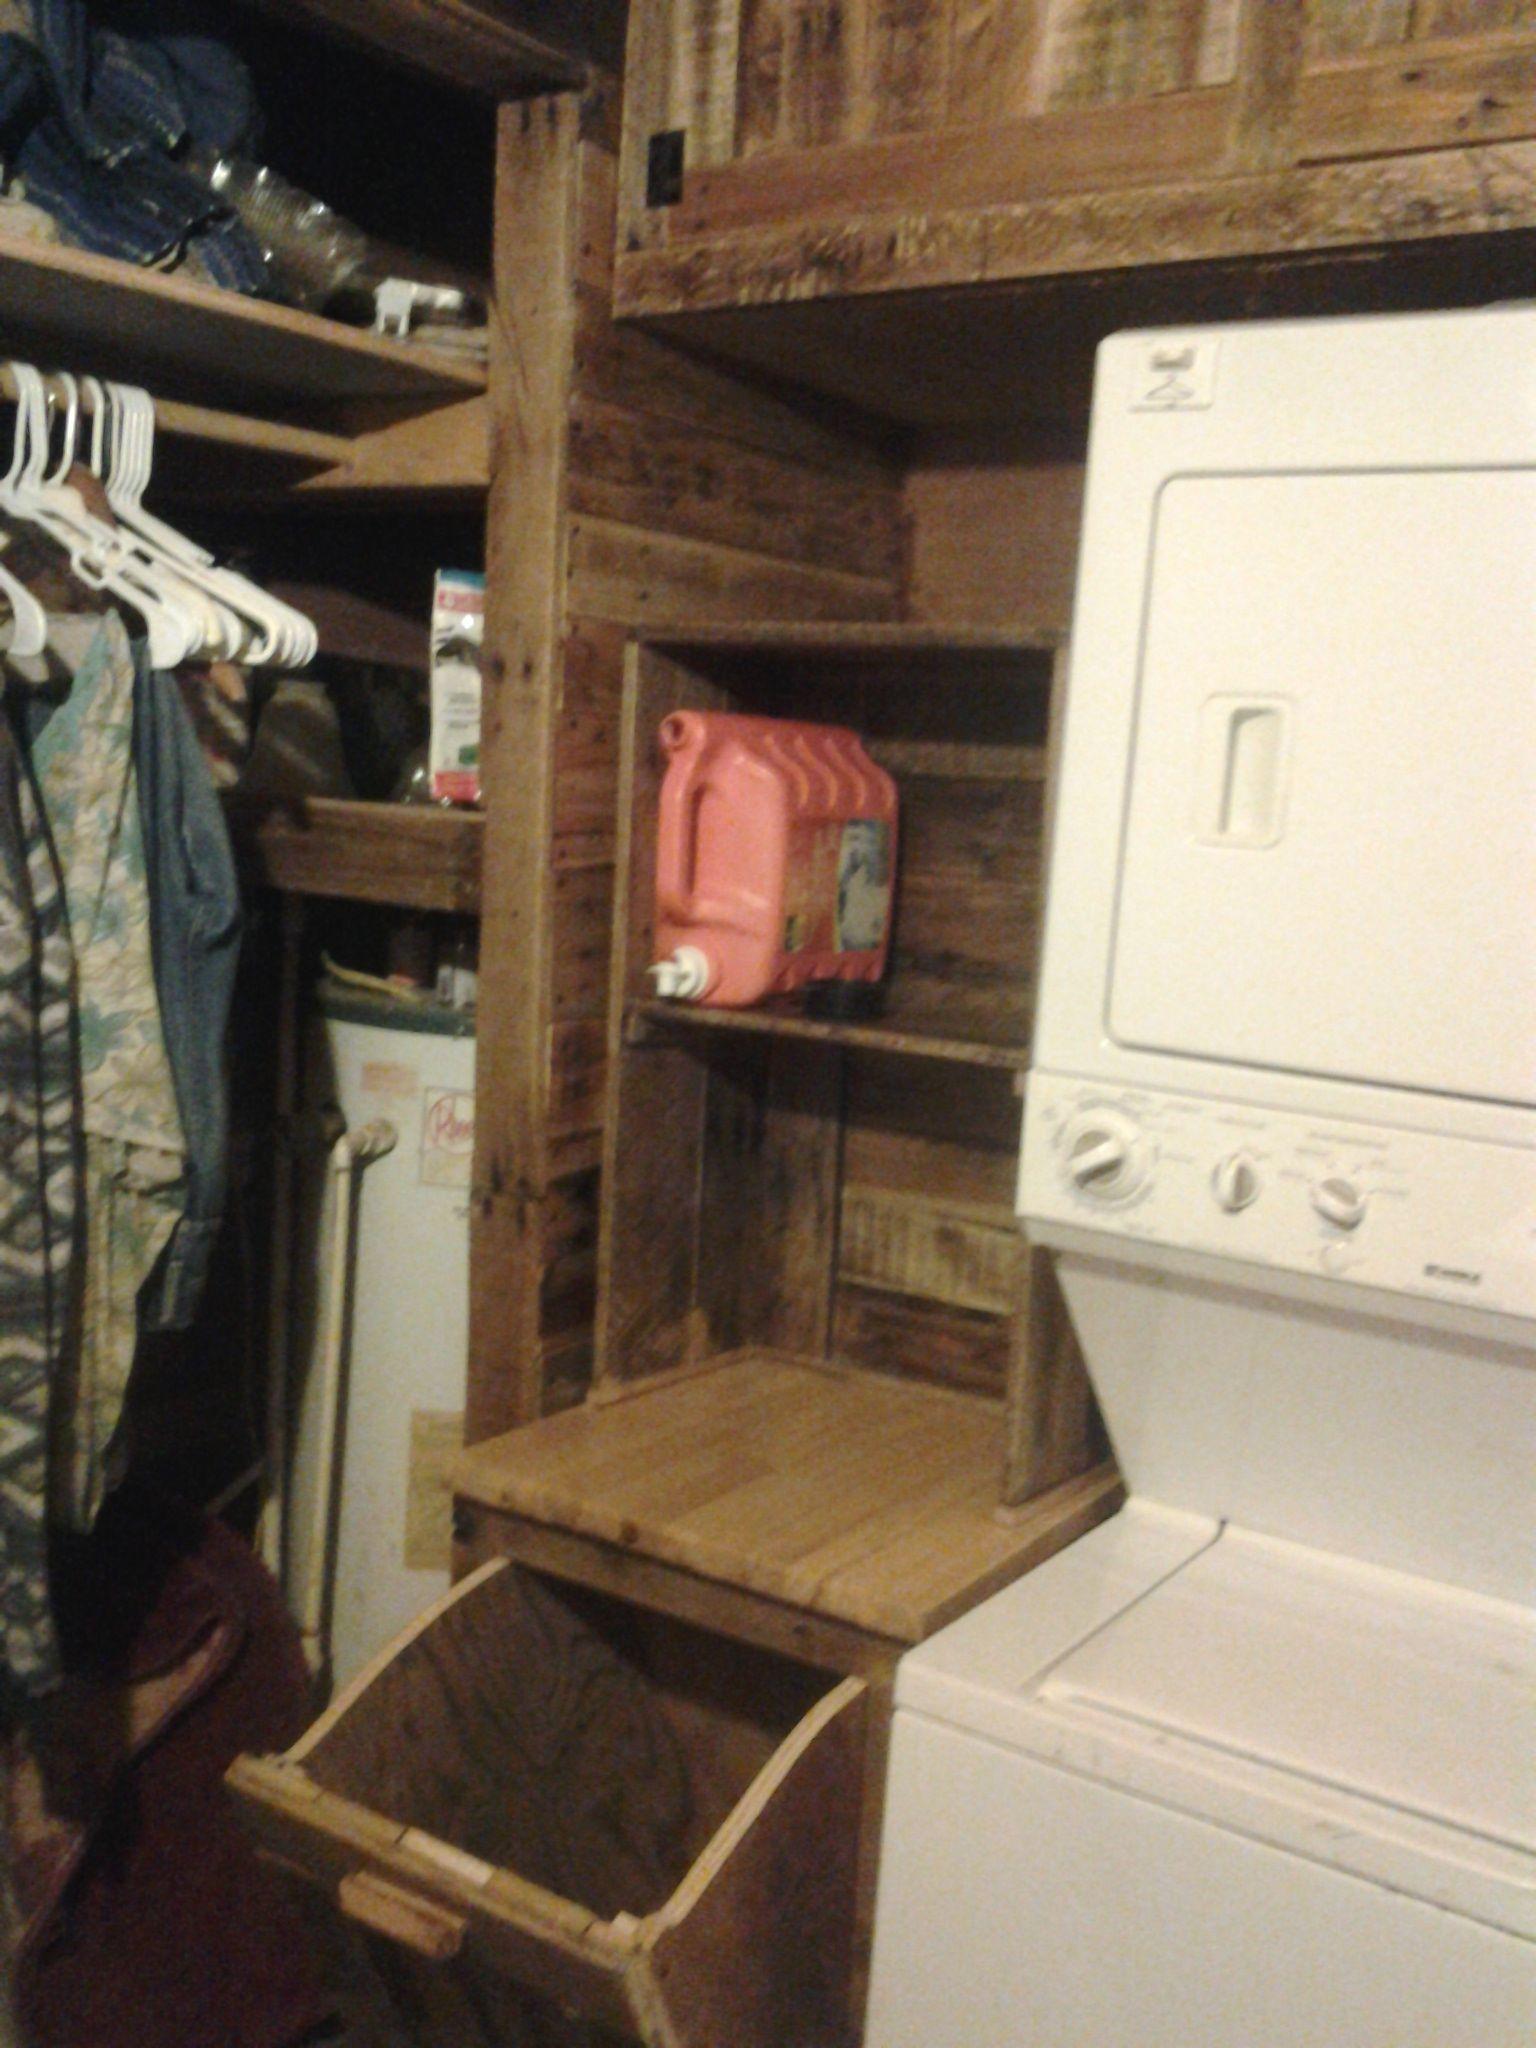 The Little Folding Table\hamper And Shelves.